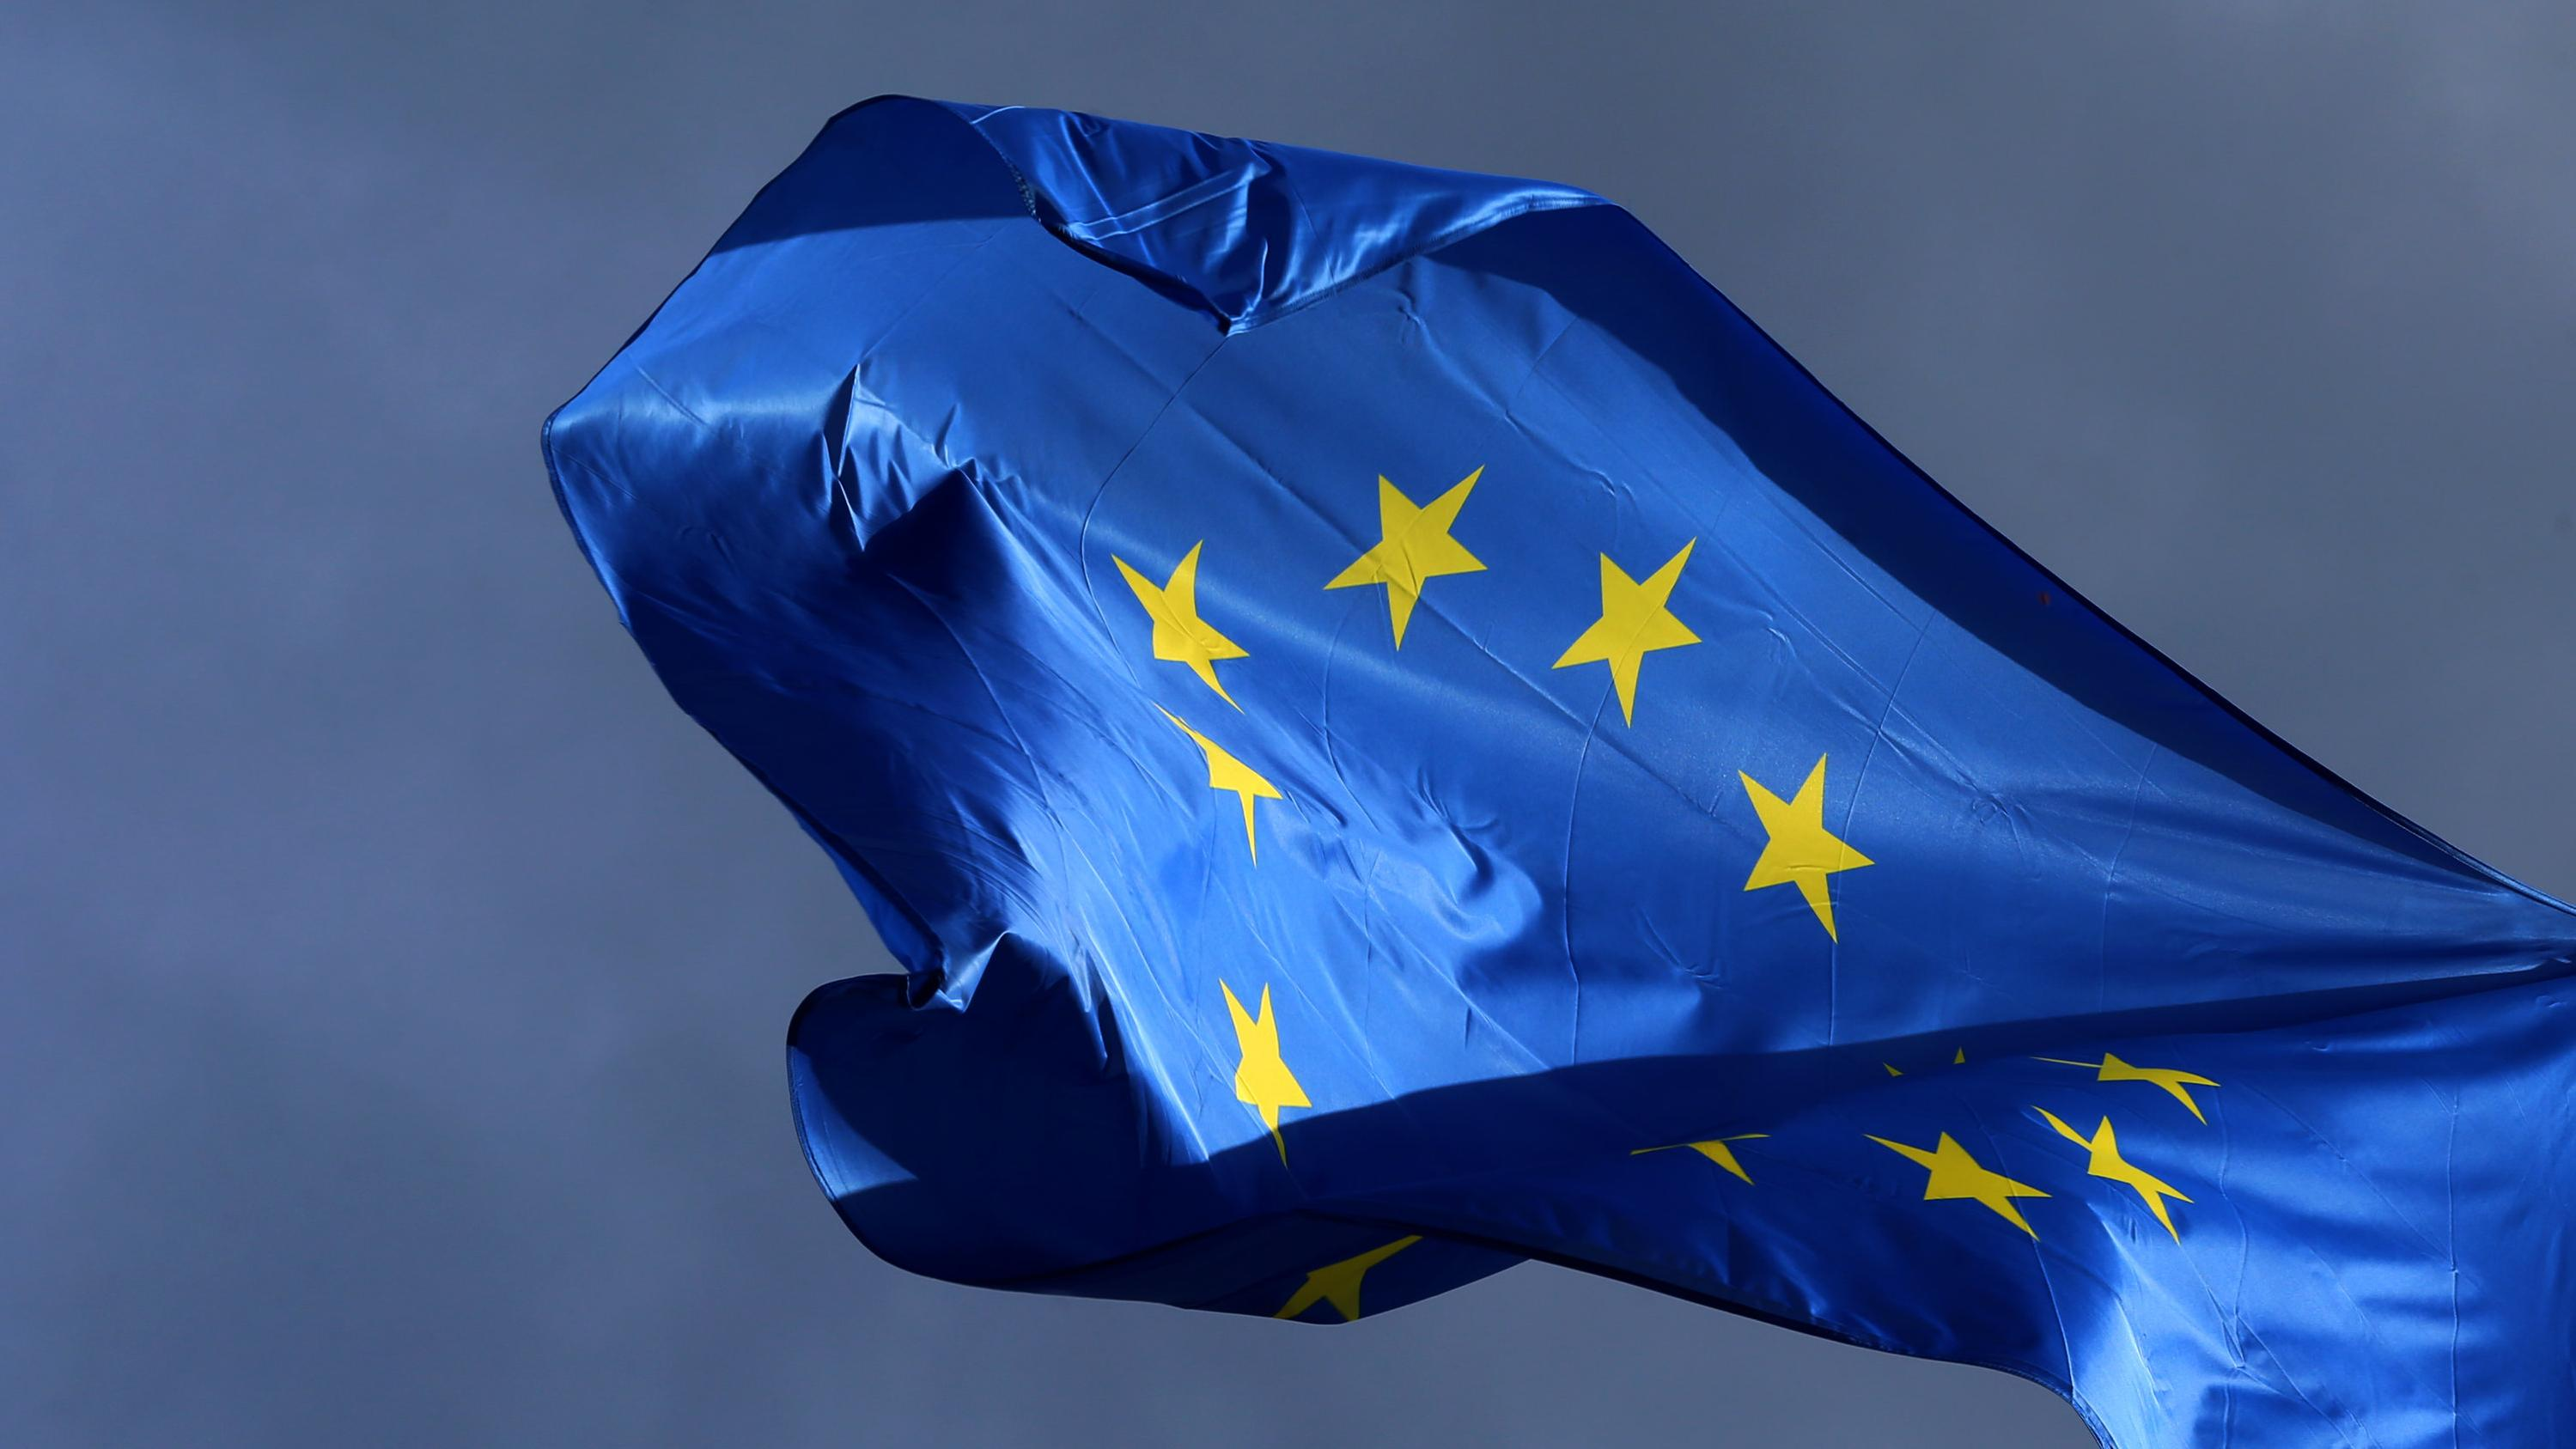 EU-Flagge flattert im Wind